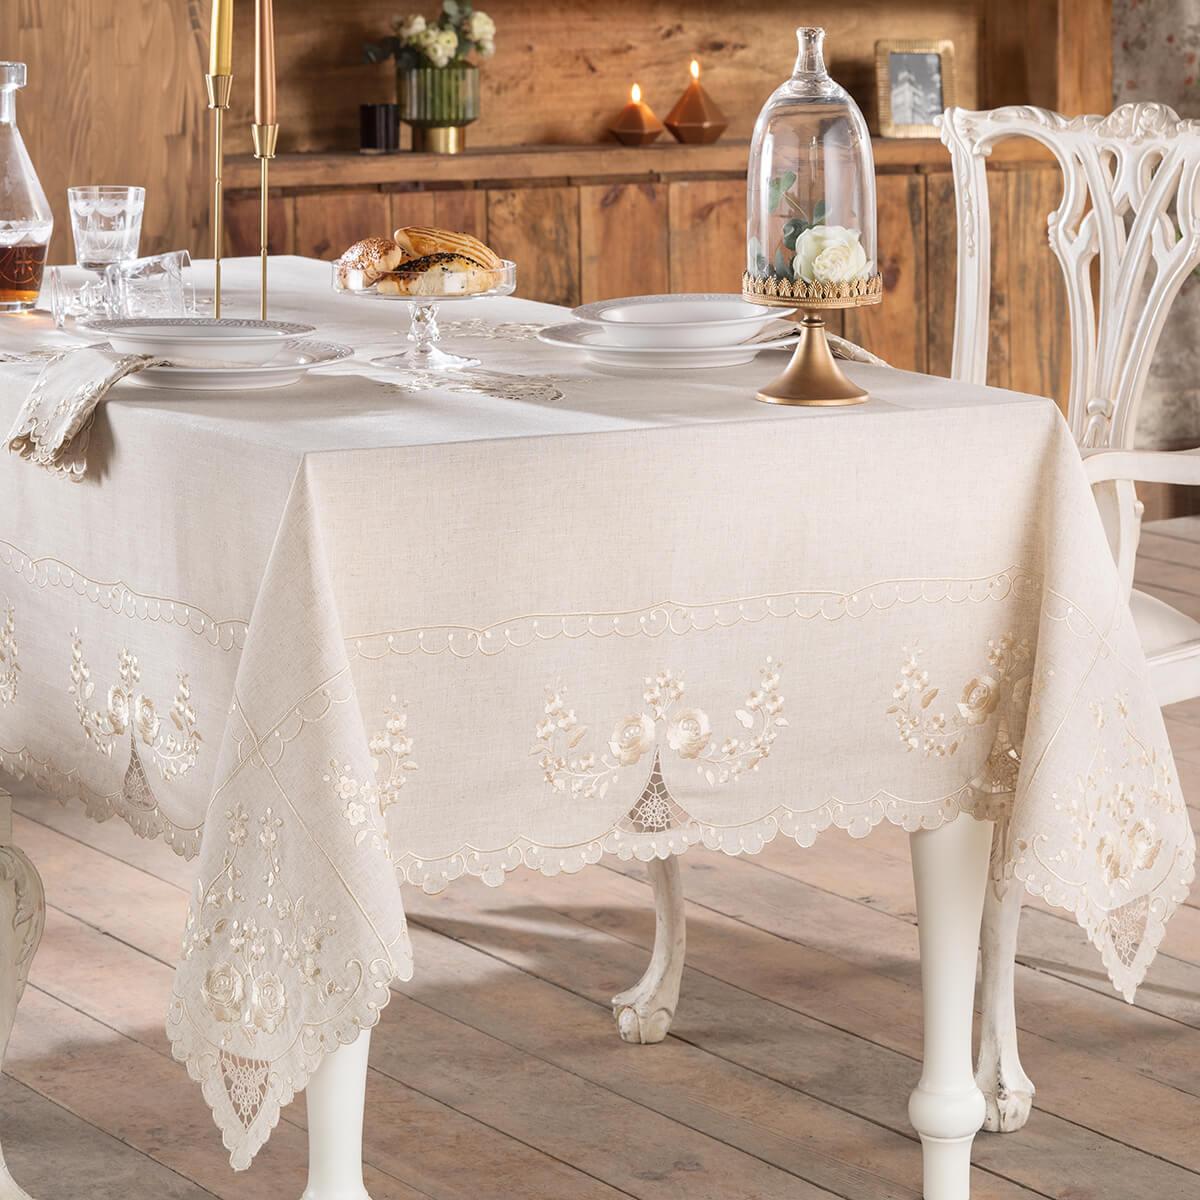 Belenda Table Clot masa örtüsü